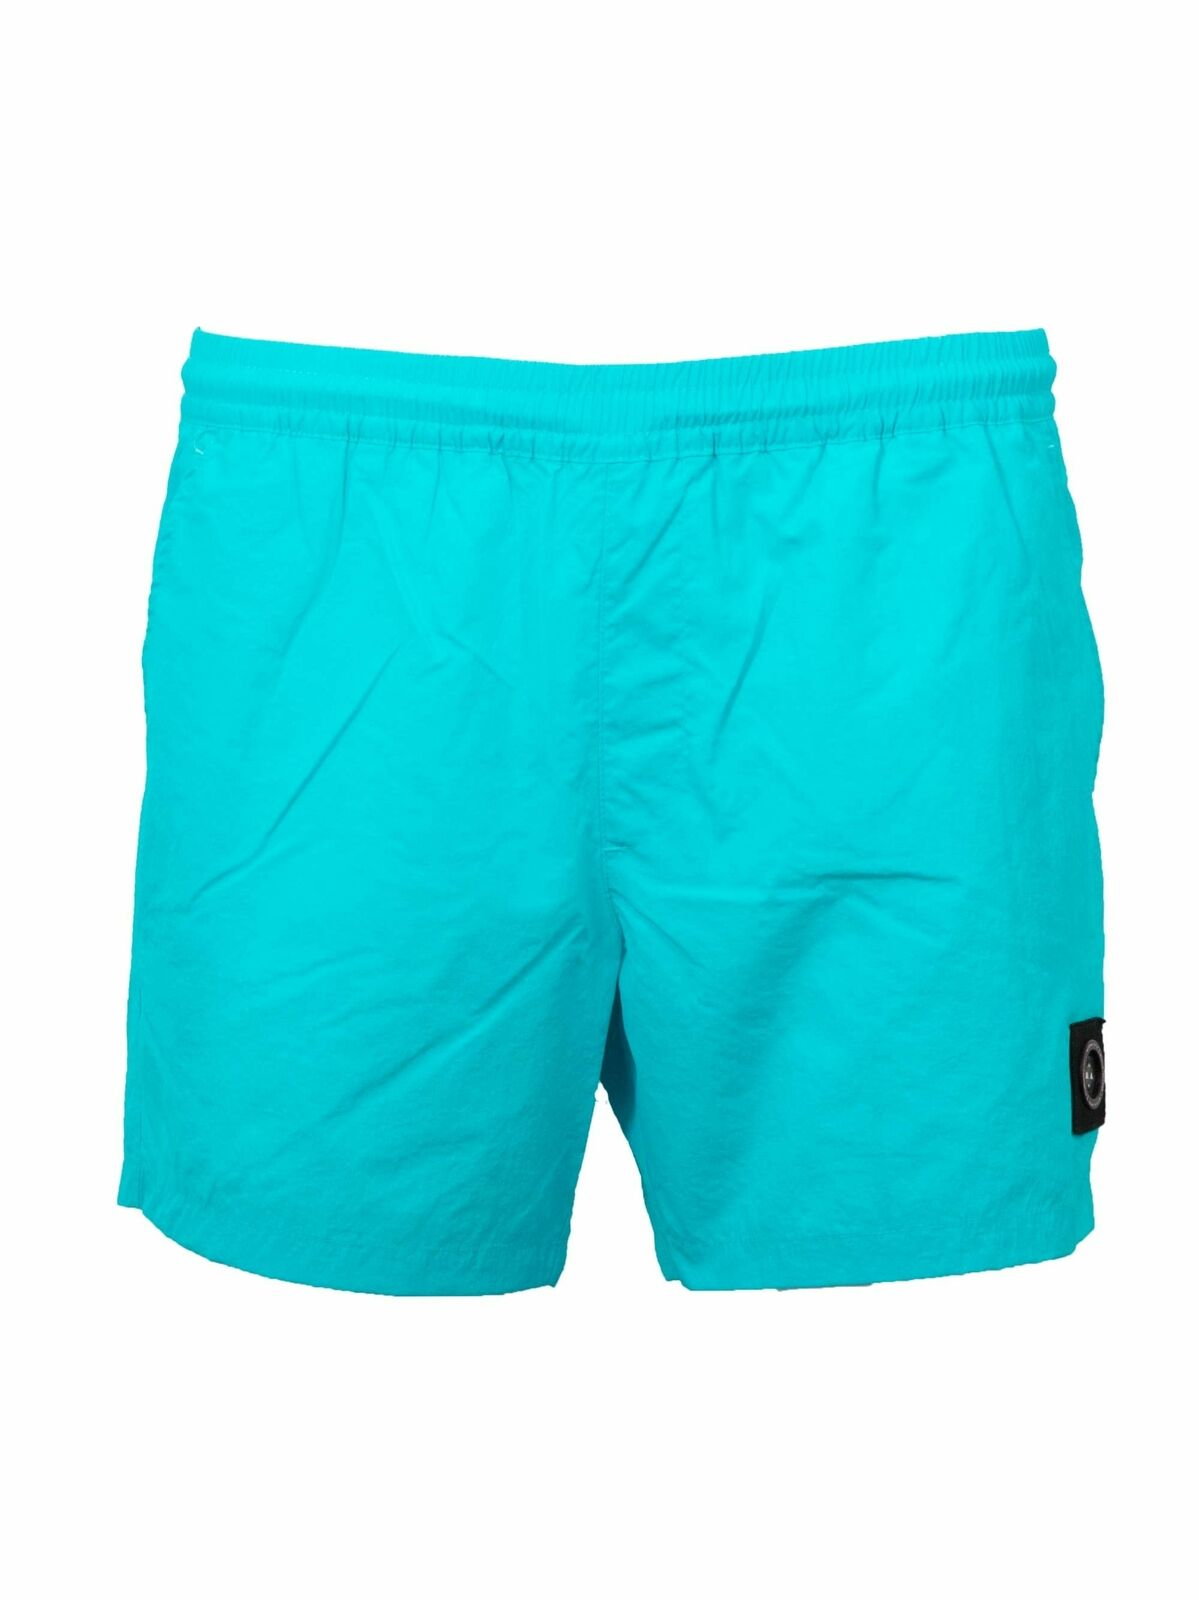 Marshall Artist Aqua bluee Micro Swim Short